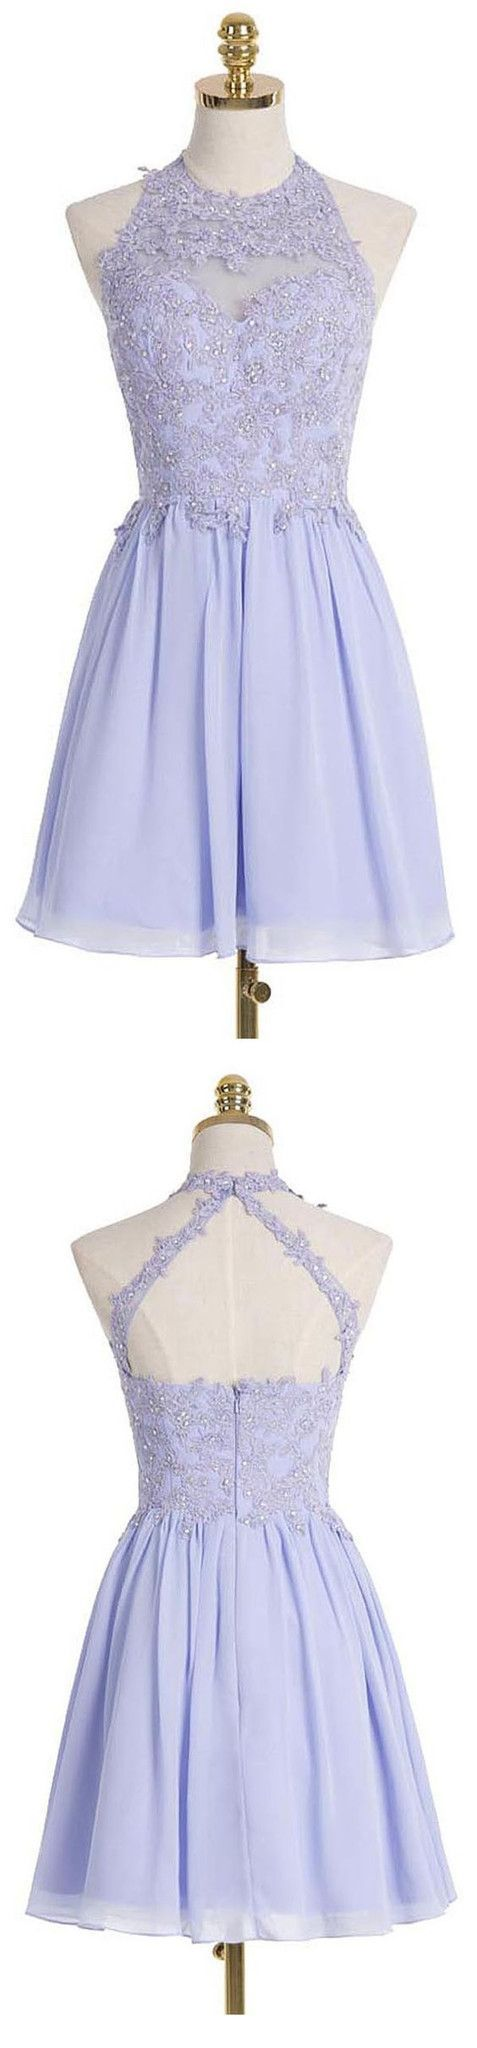 Aline halter short lilac chiffon homecoming dress appliques crystal